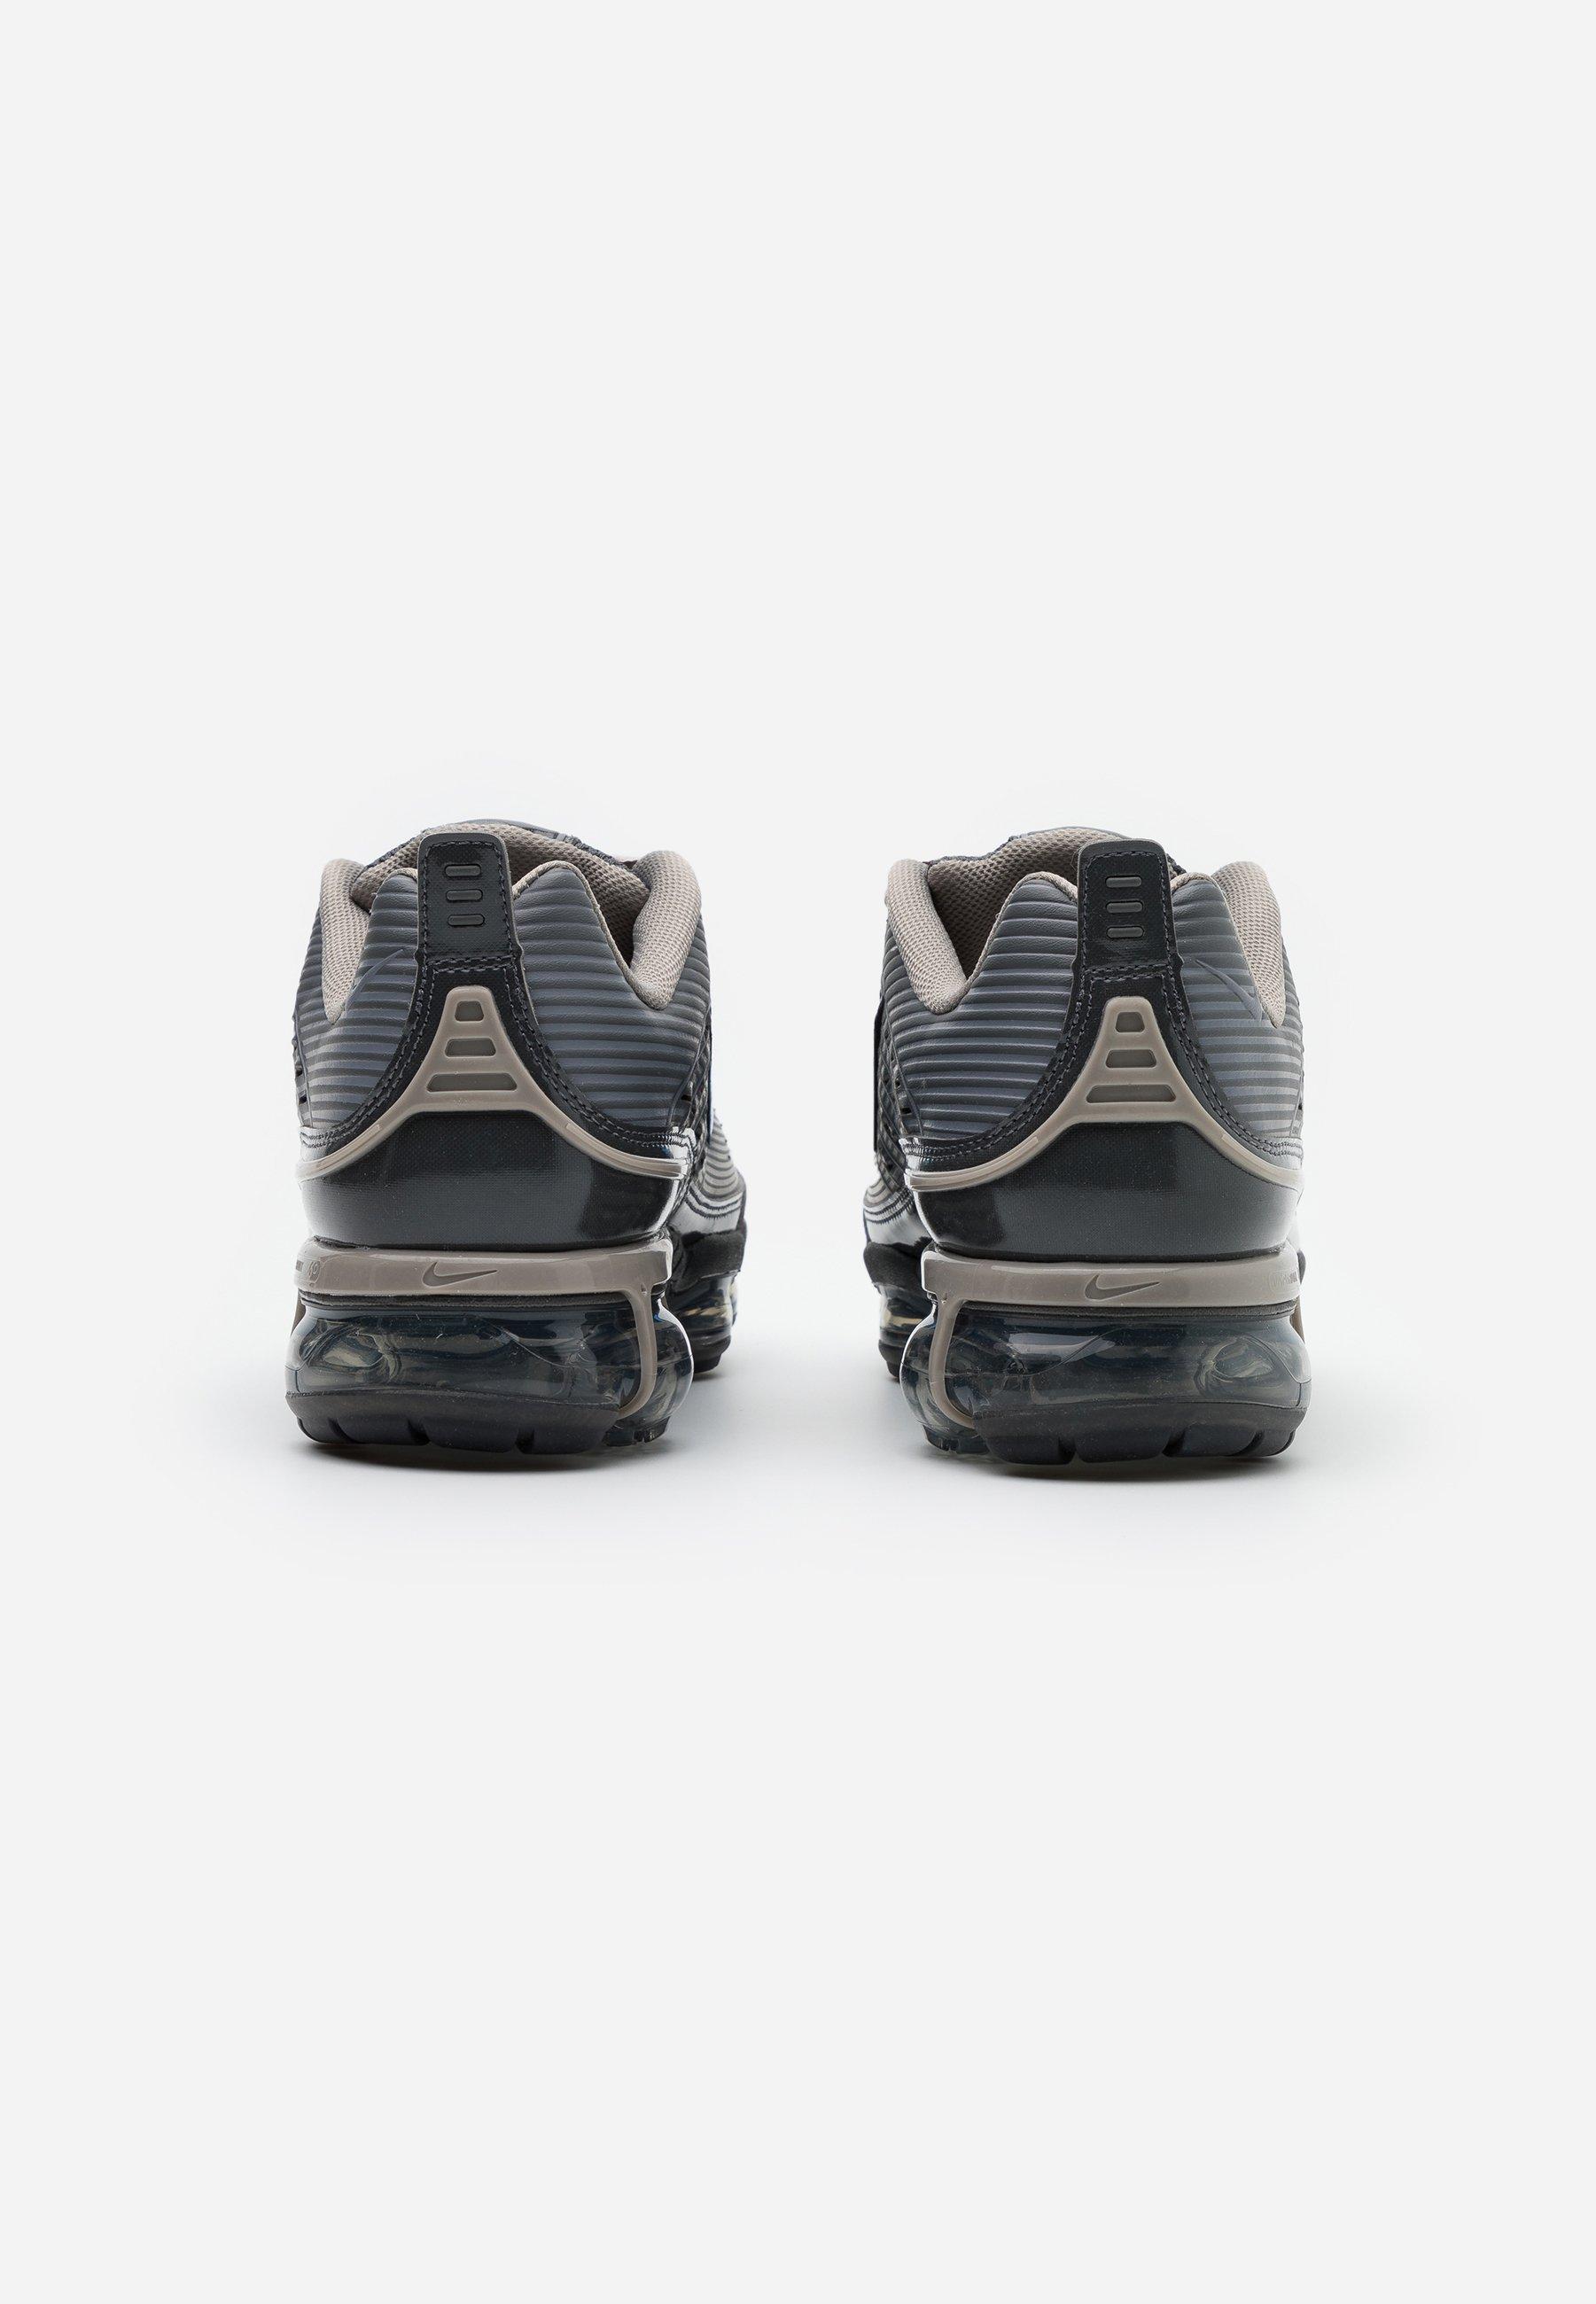 Meilleurs prix Nike Sportswear AIR VAPORMAX 360 Baskets basses iron grey/enigma stone/metallic cool grey/black/anthracite